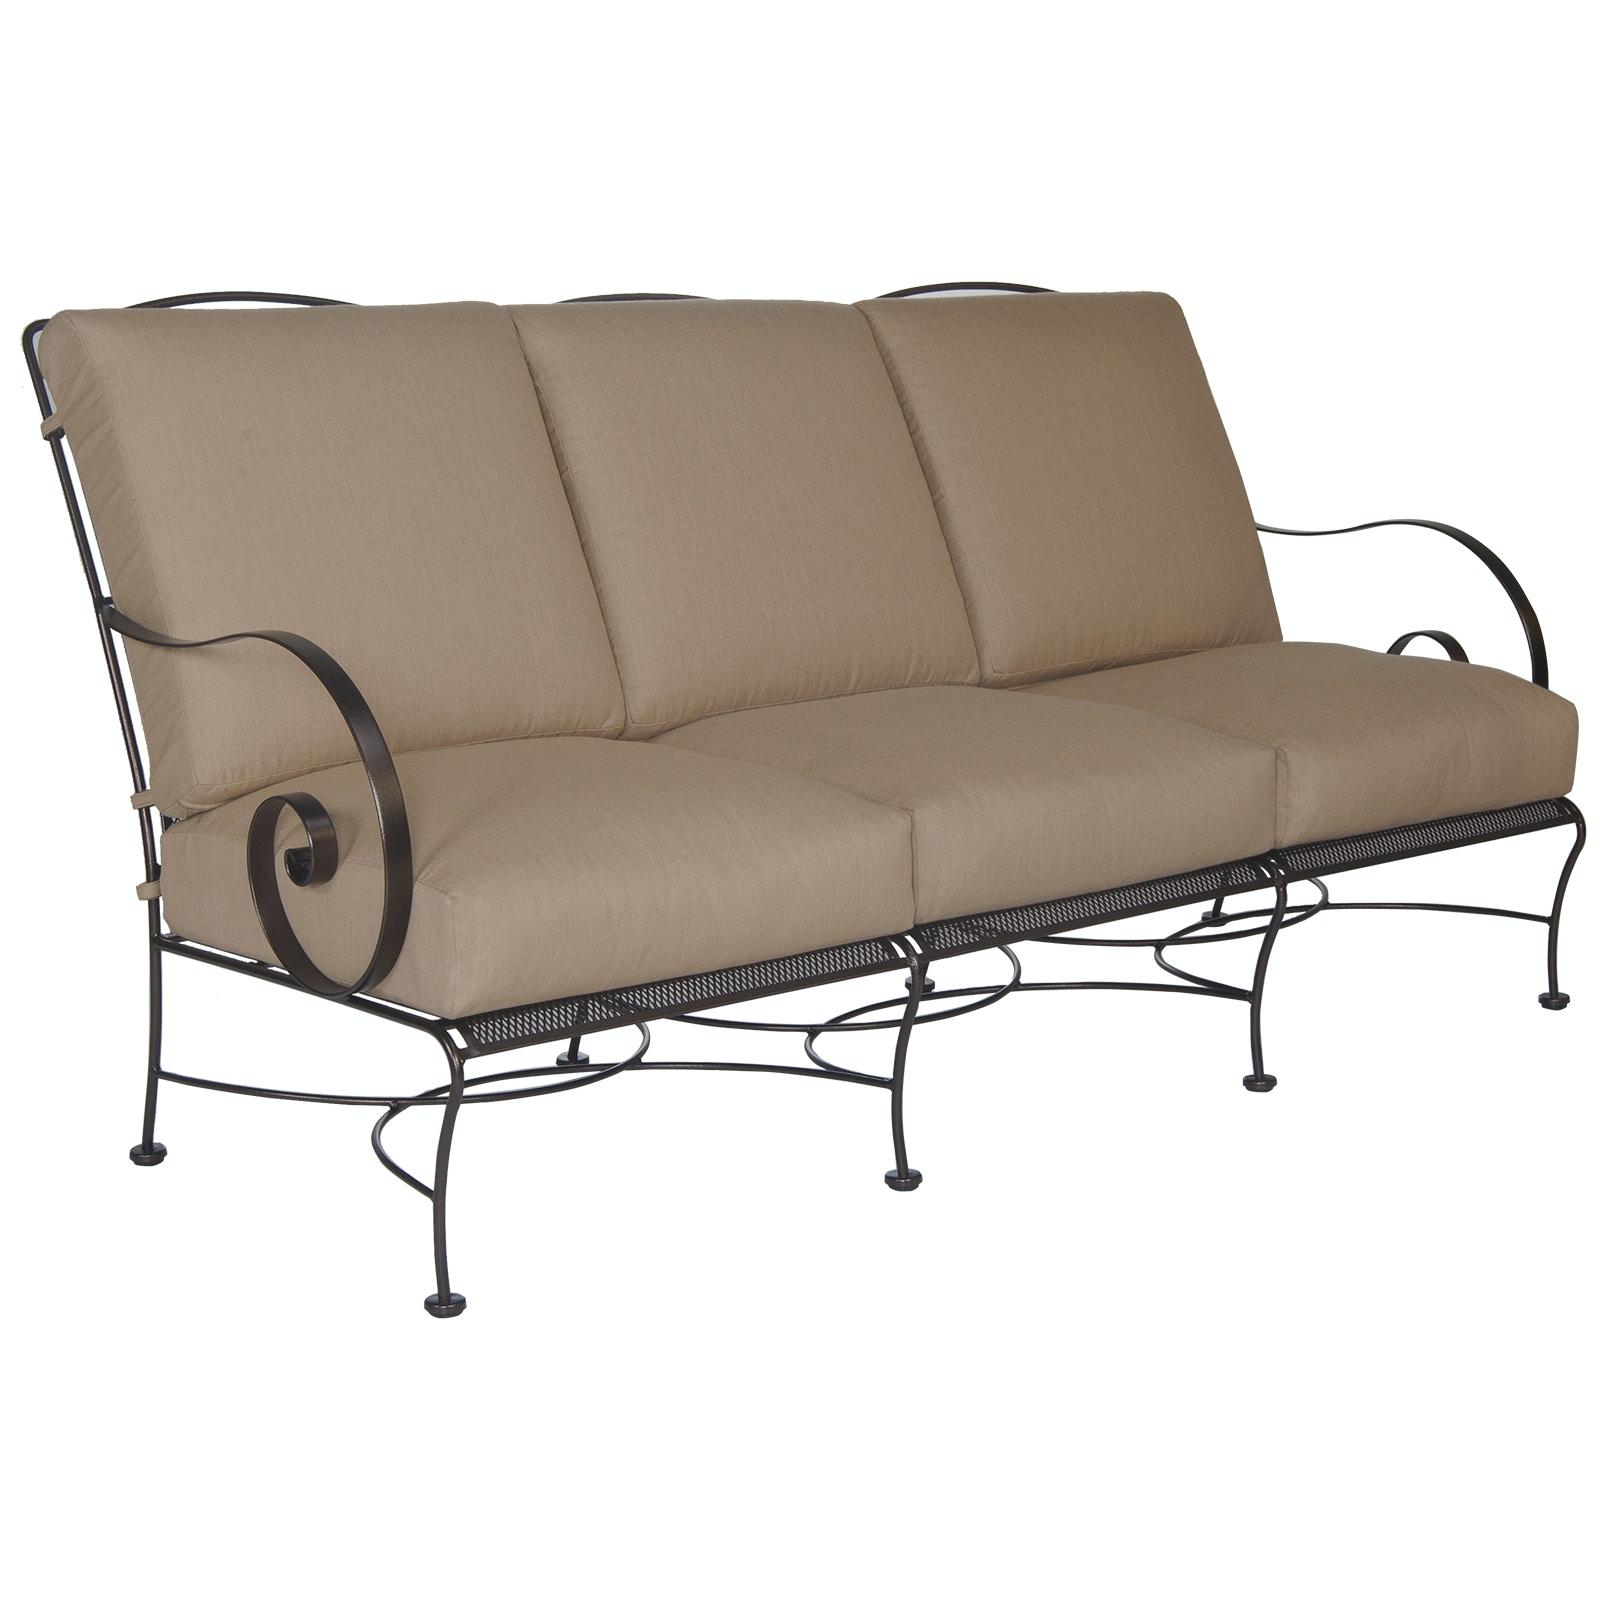 Superieur OW Lee Furniture Avalon Sofa 4355 3S